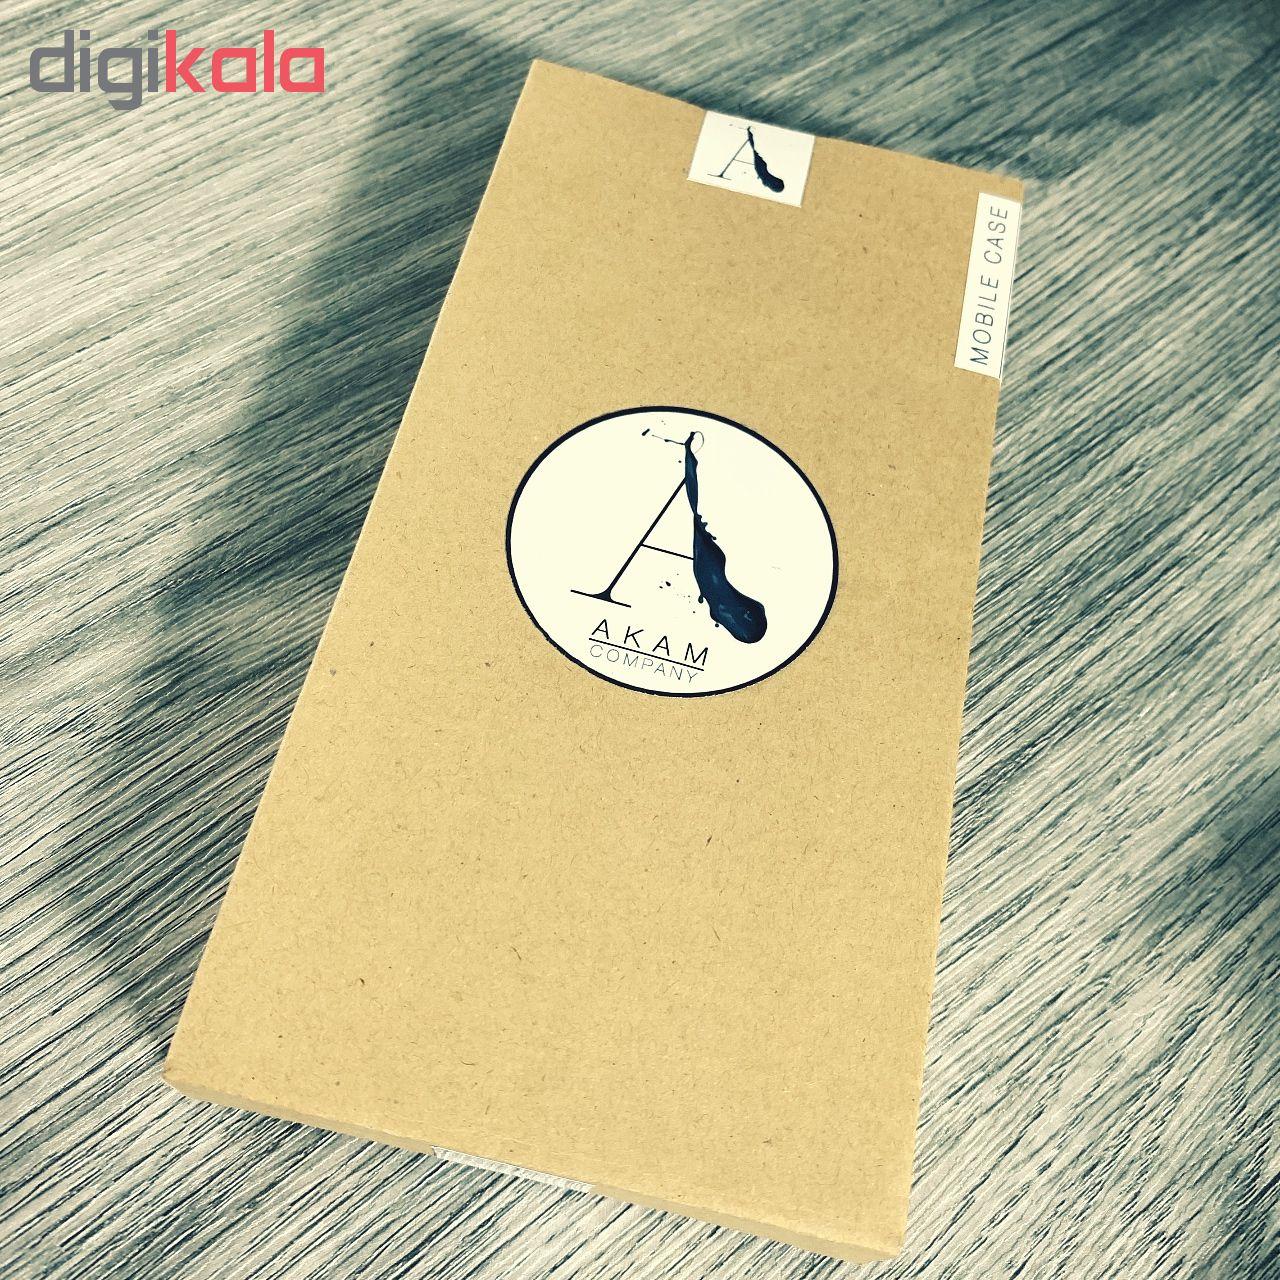 کاور آکام مدل Aa201575 مناسب برای گوشی موبایل سامسونگ Galaxy A20/A30